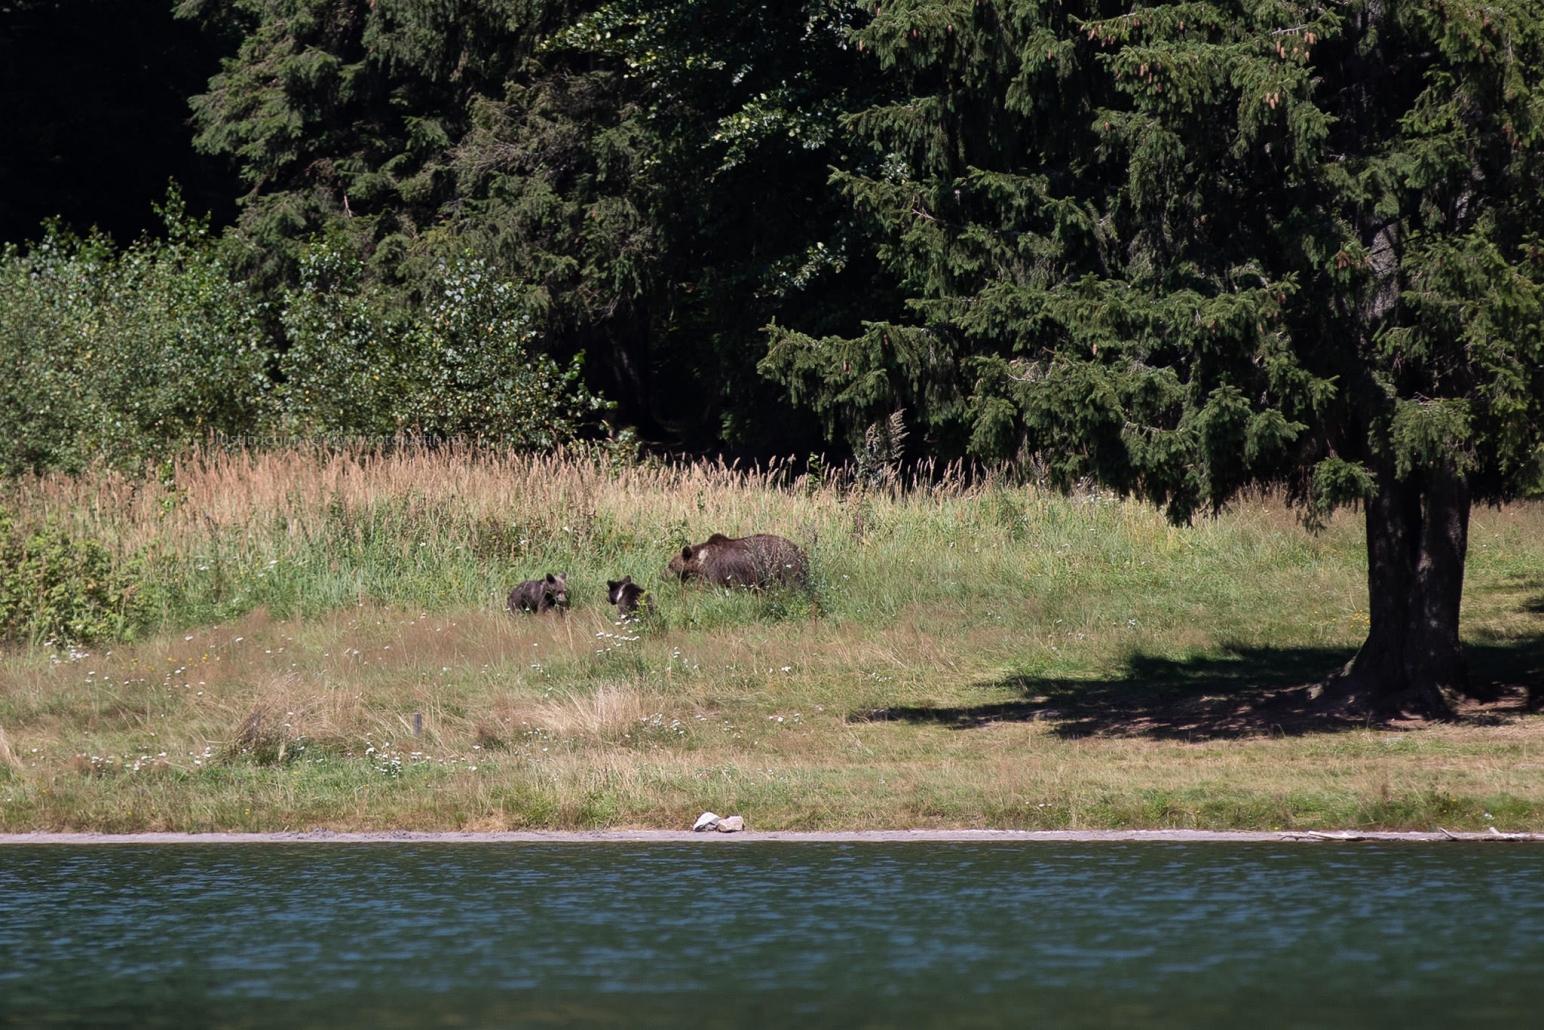 Familie de ursi in libertate